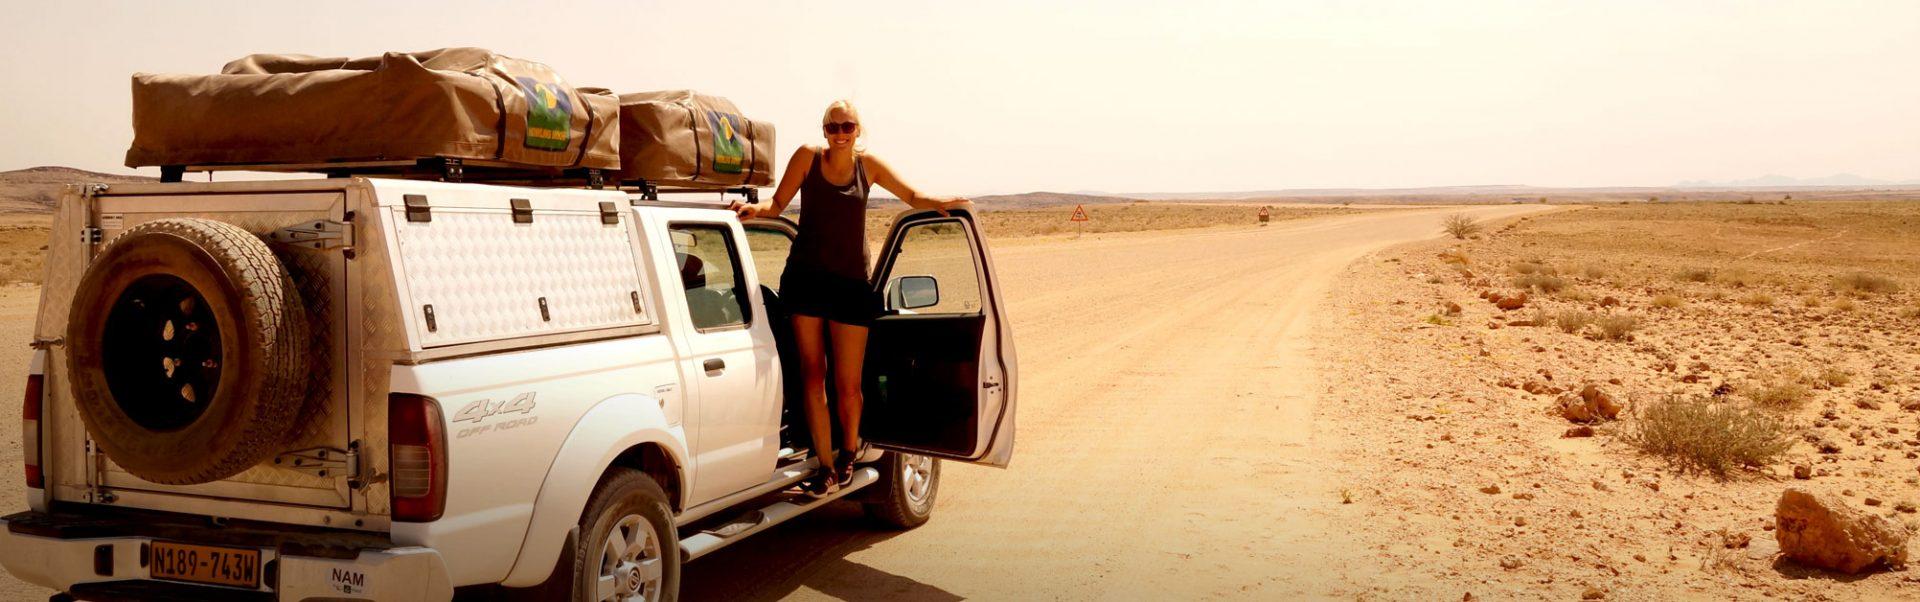 bei namibia individualreisen individuell reisen